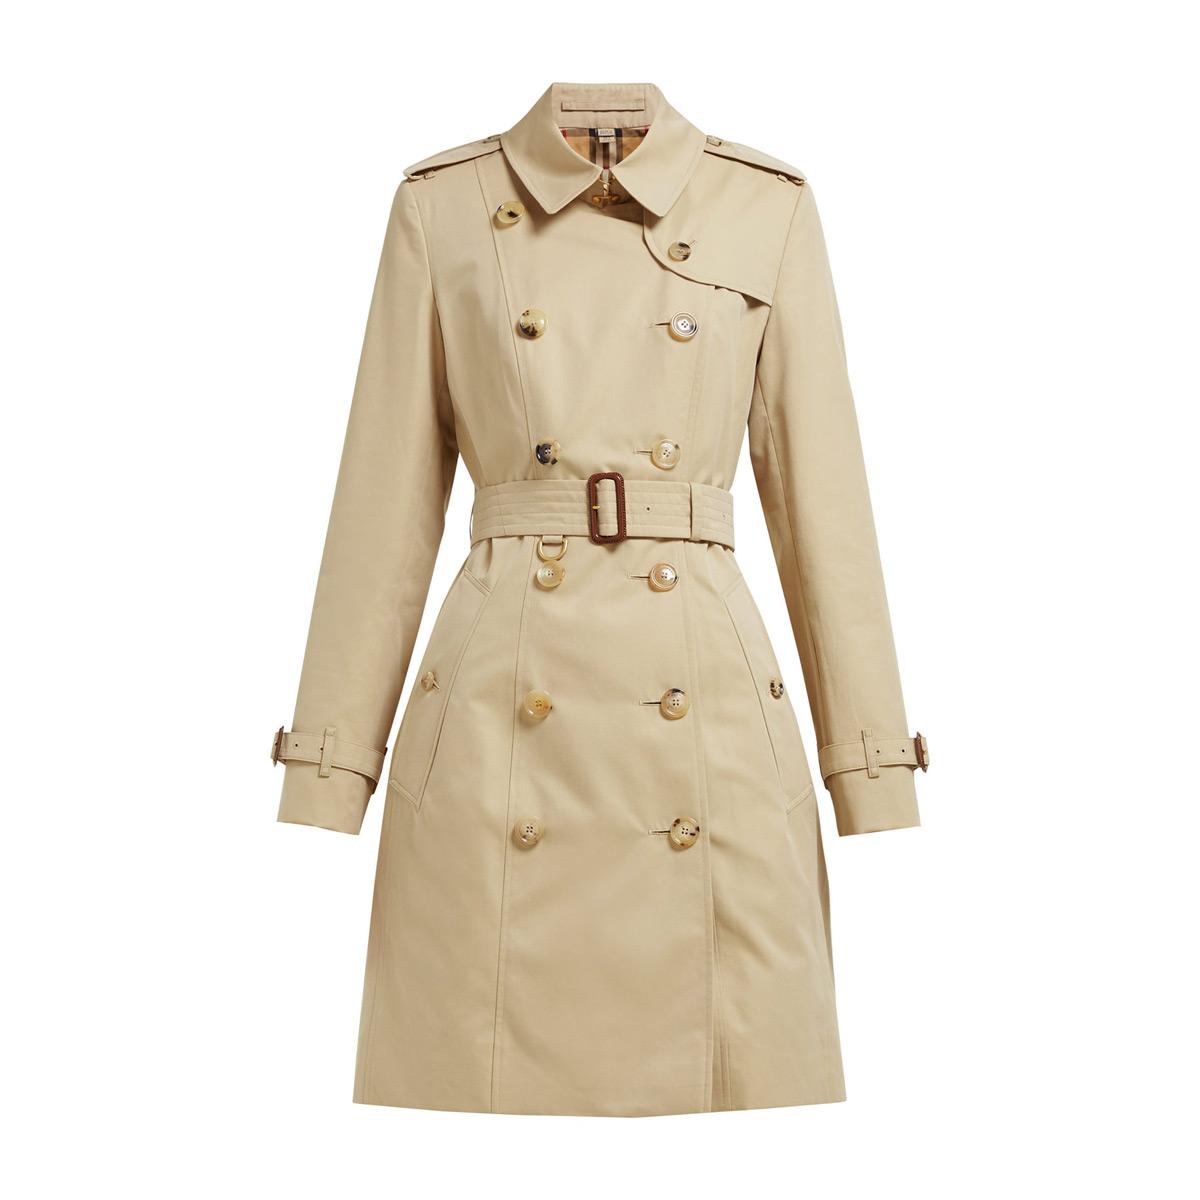 burberry chelsea heritage cotton gabardine trench coat